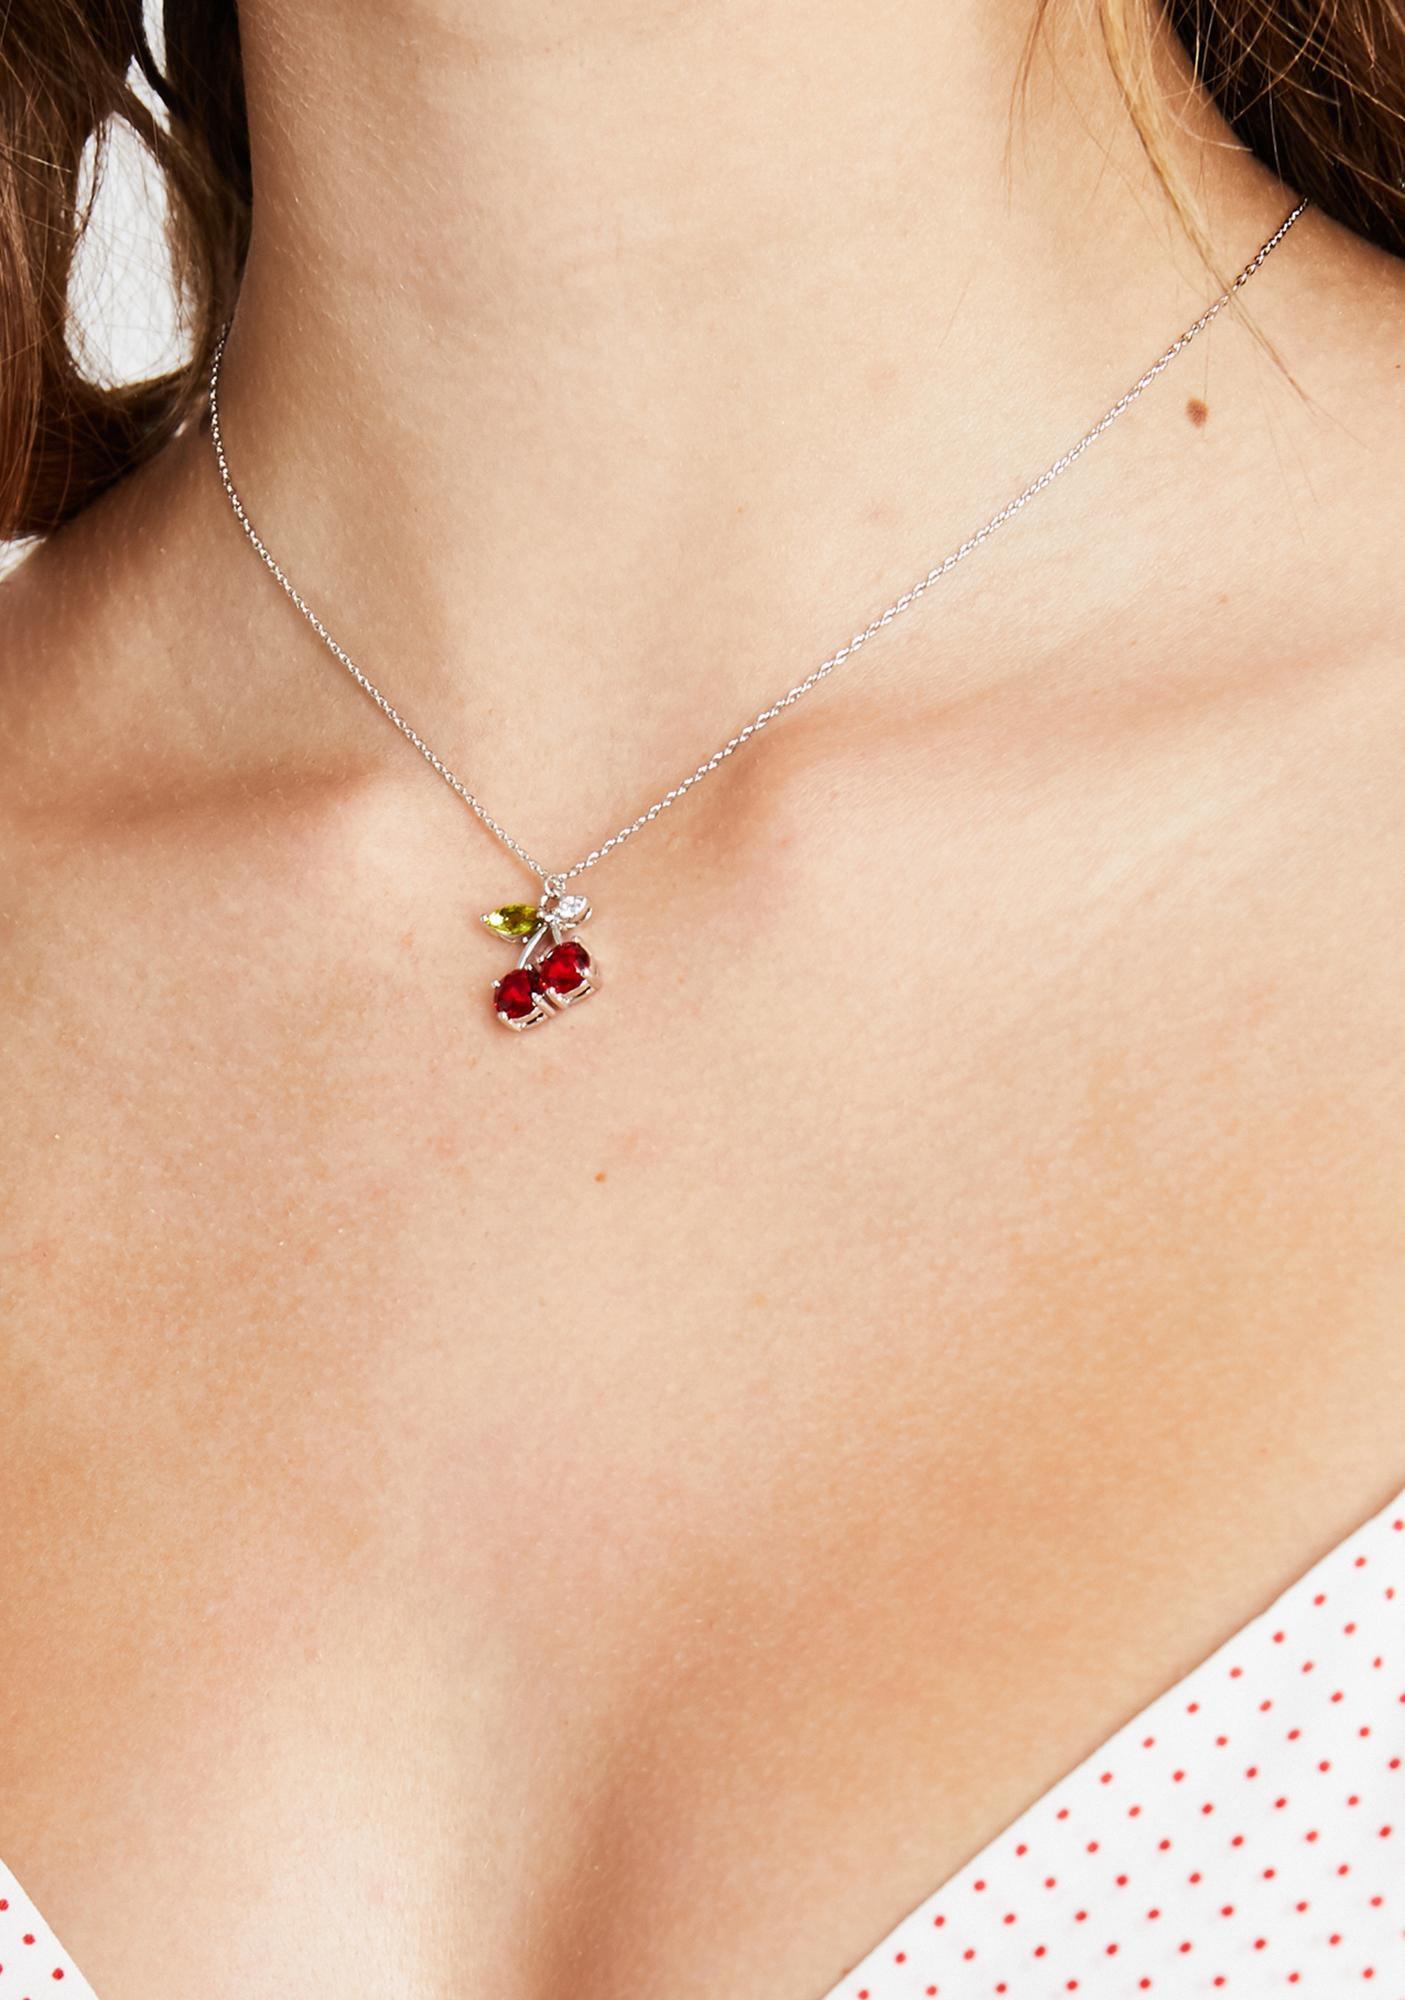 Cherry Charm Chain Necklace | Dolls Kill